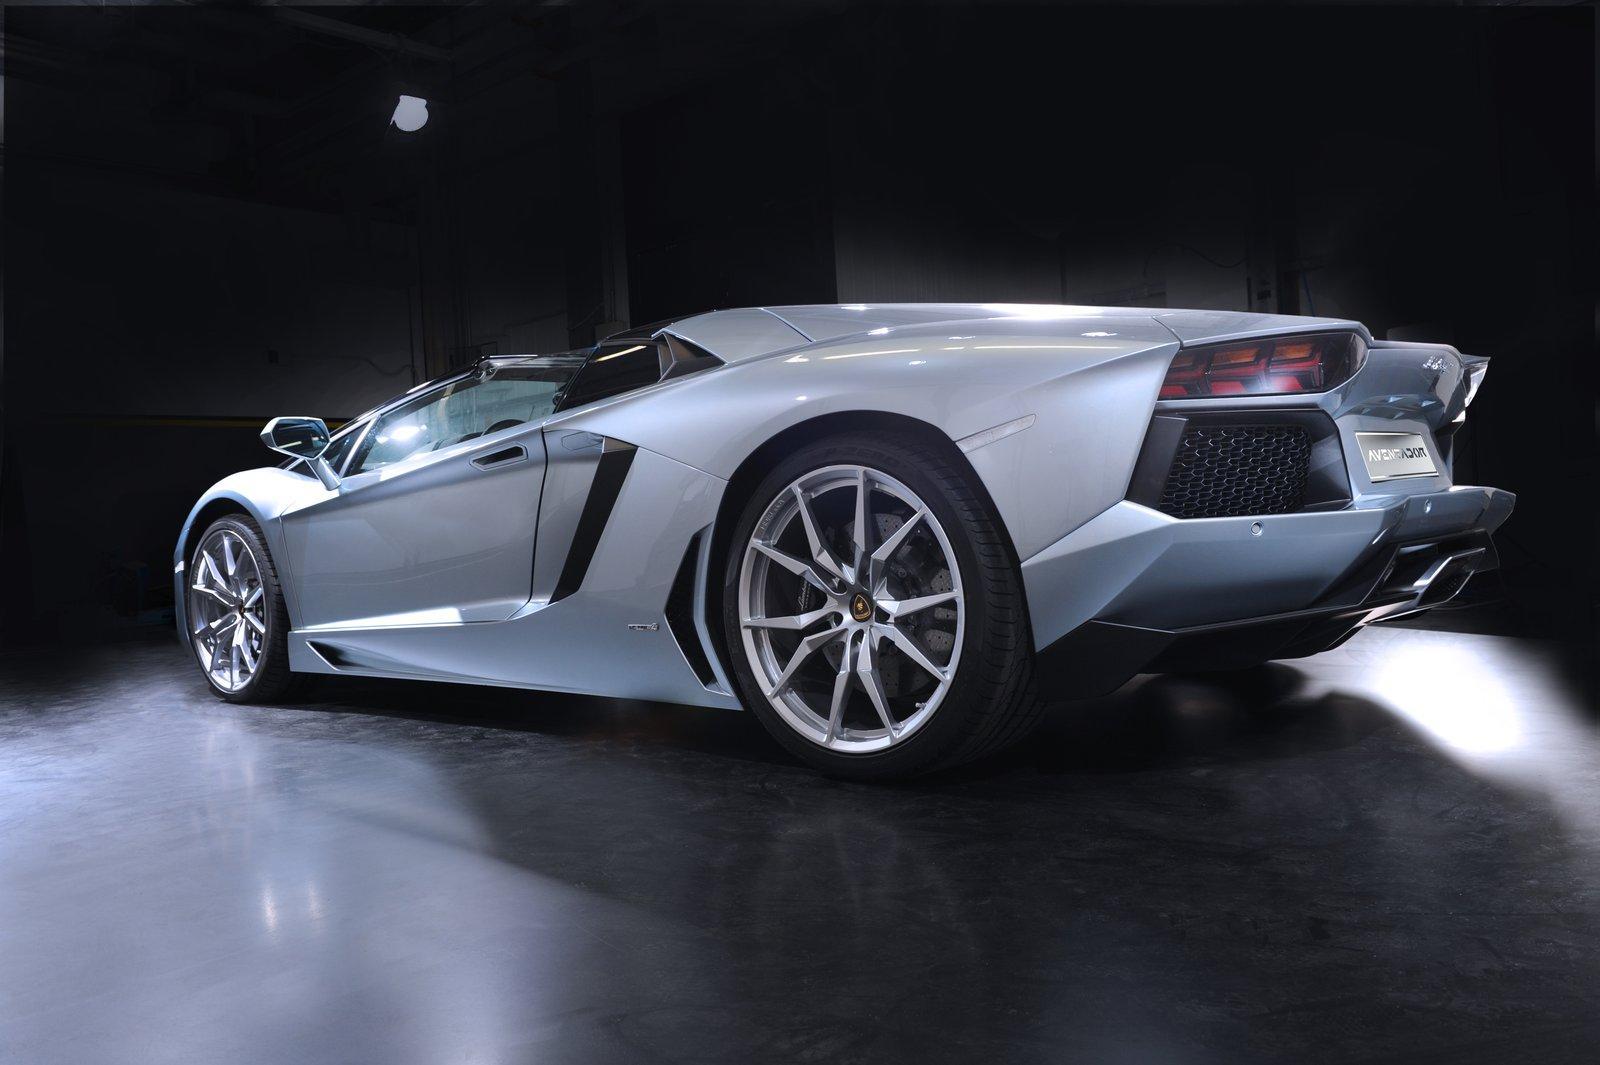 2013 Lamborghini Aventador LP 700-4 Roadster